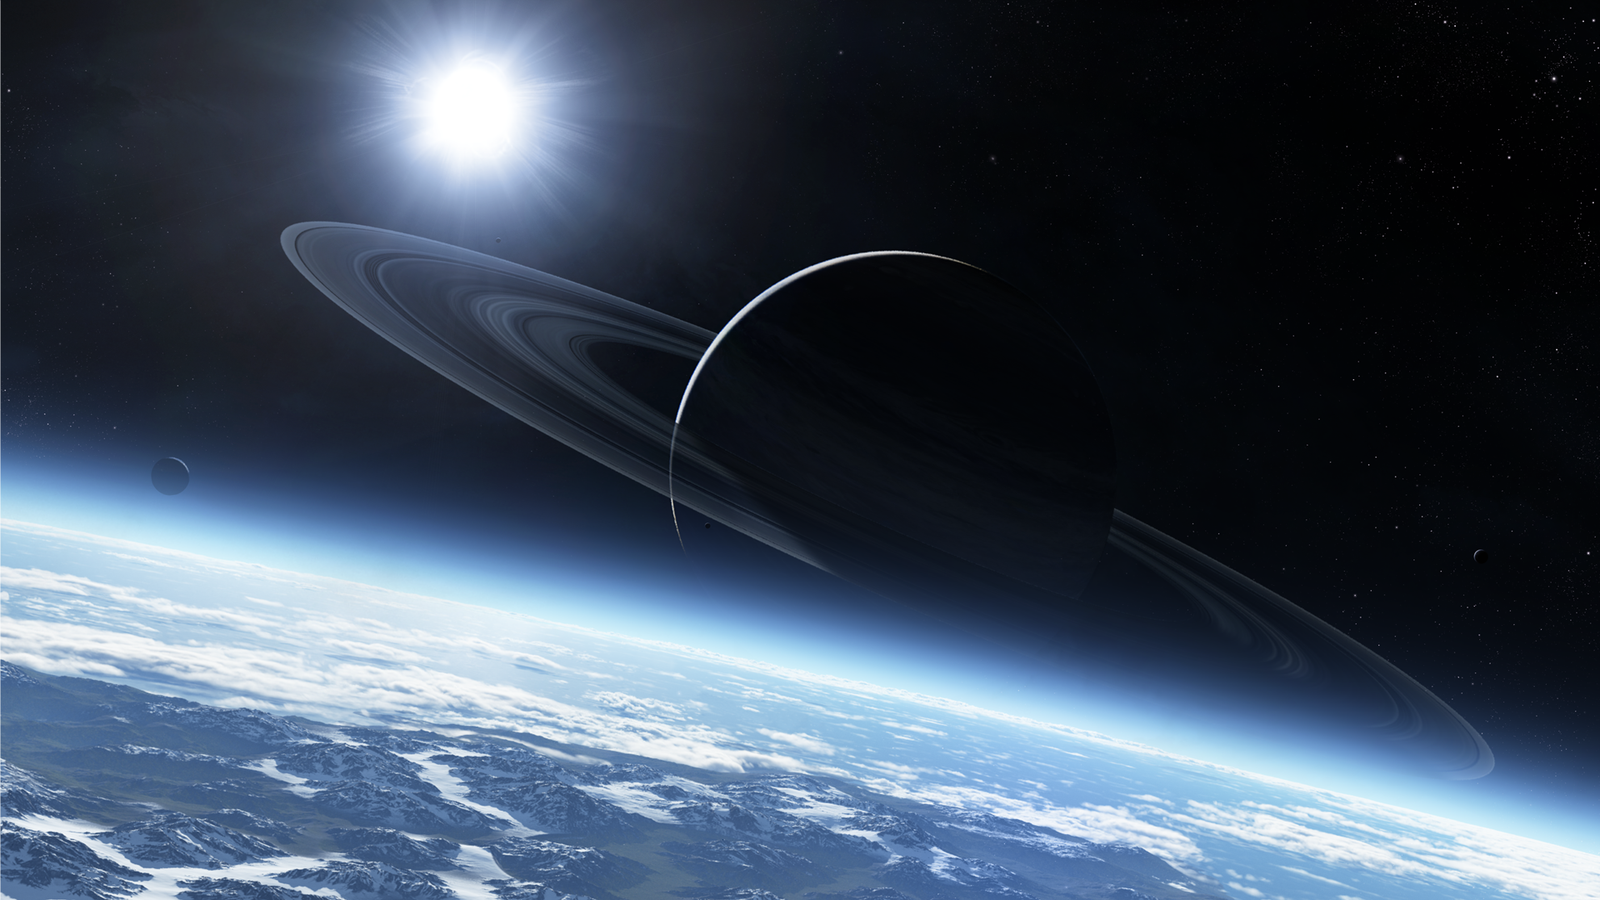 Stratosphere by Gannaingh32